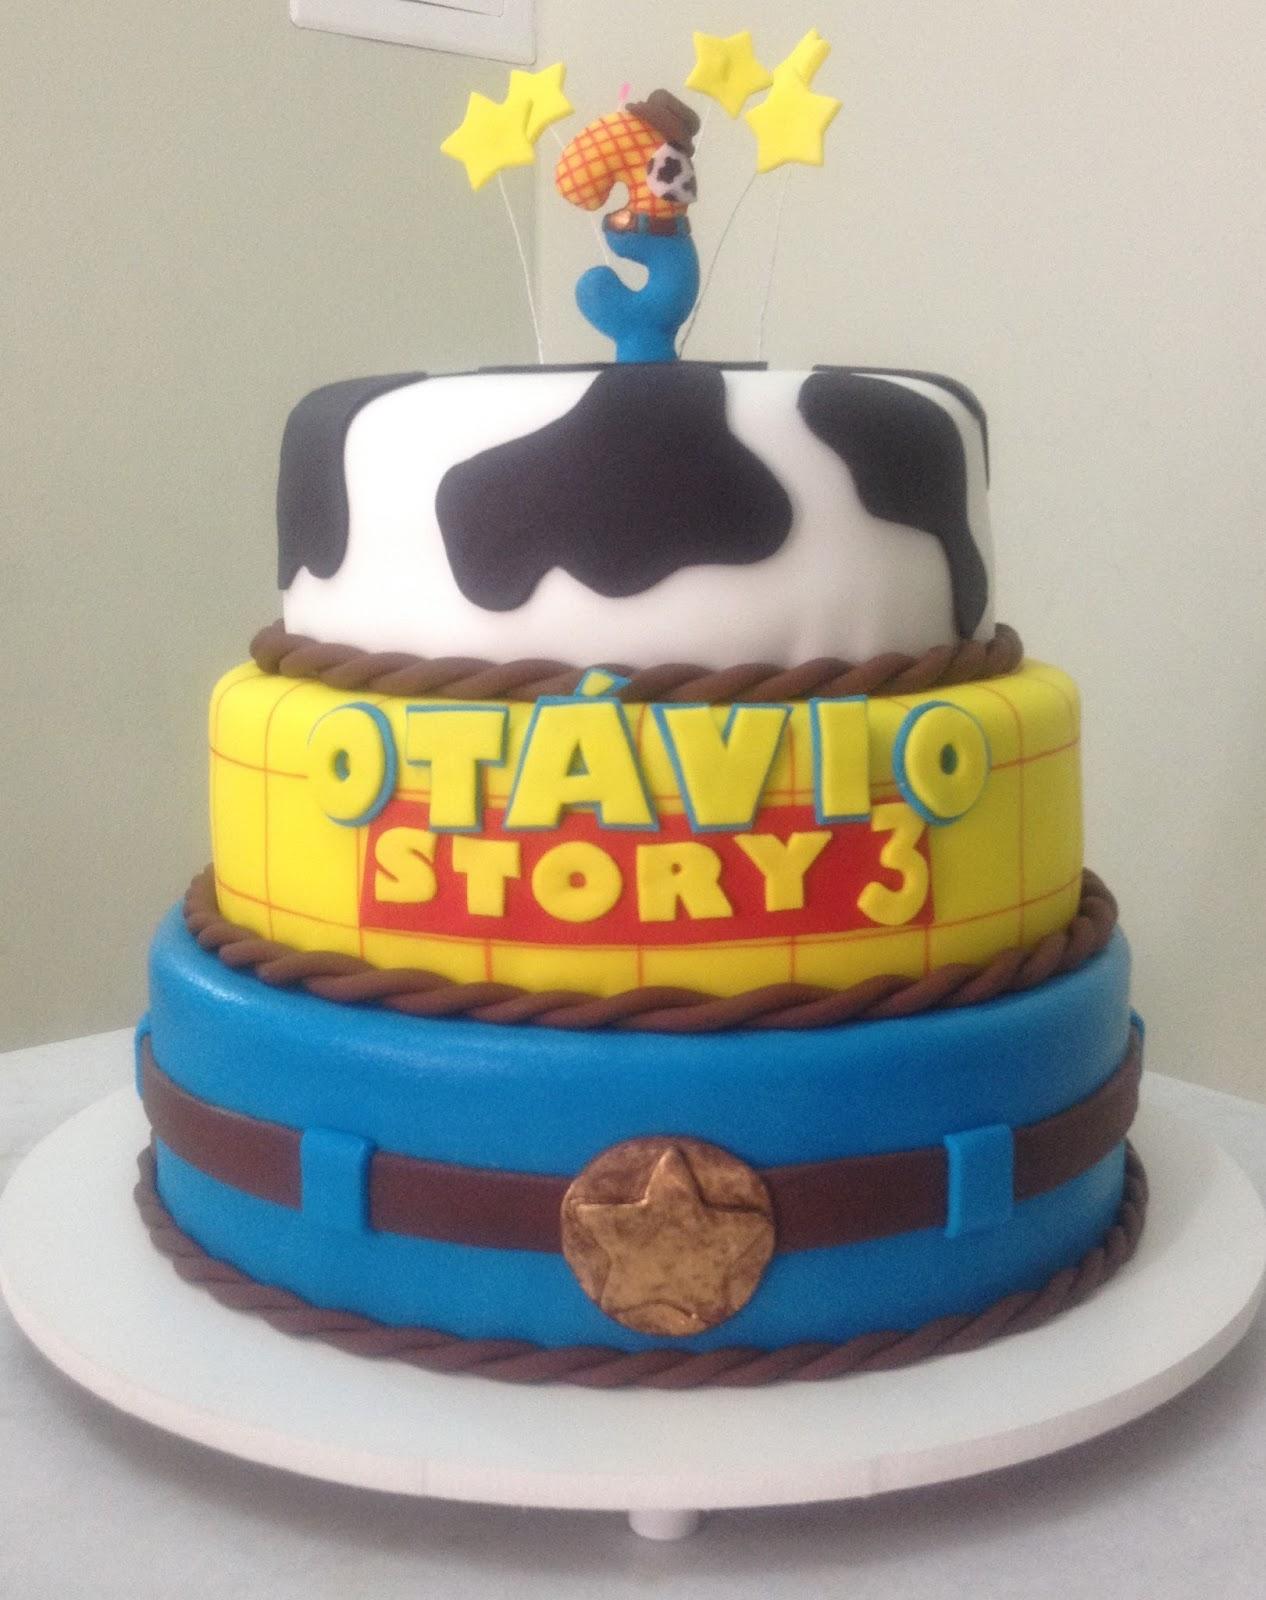 Populares Sugar Bella - Biscoitos e doces artesanais: Bolo Toy Story ZA65